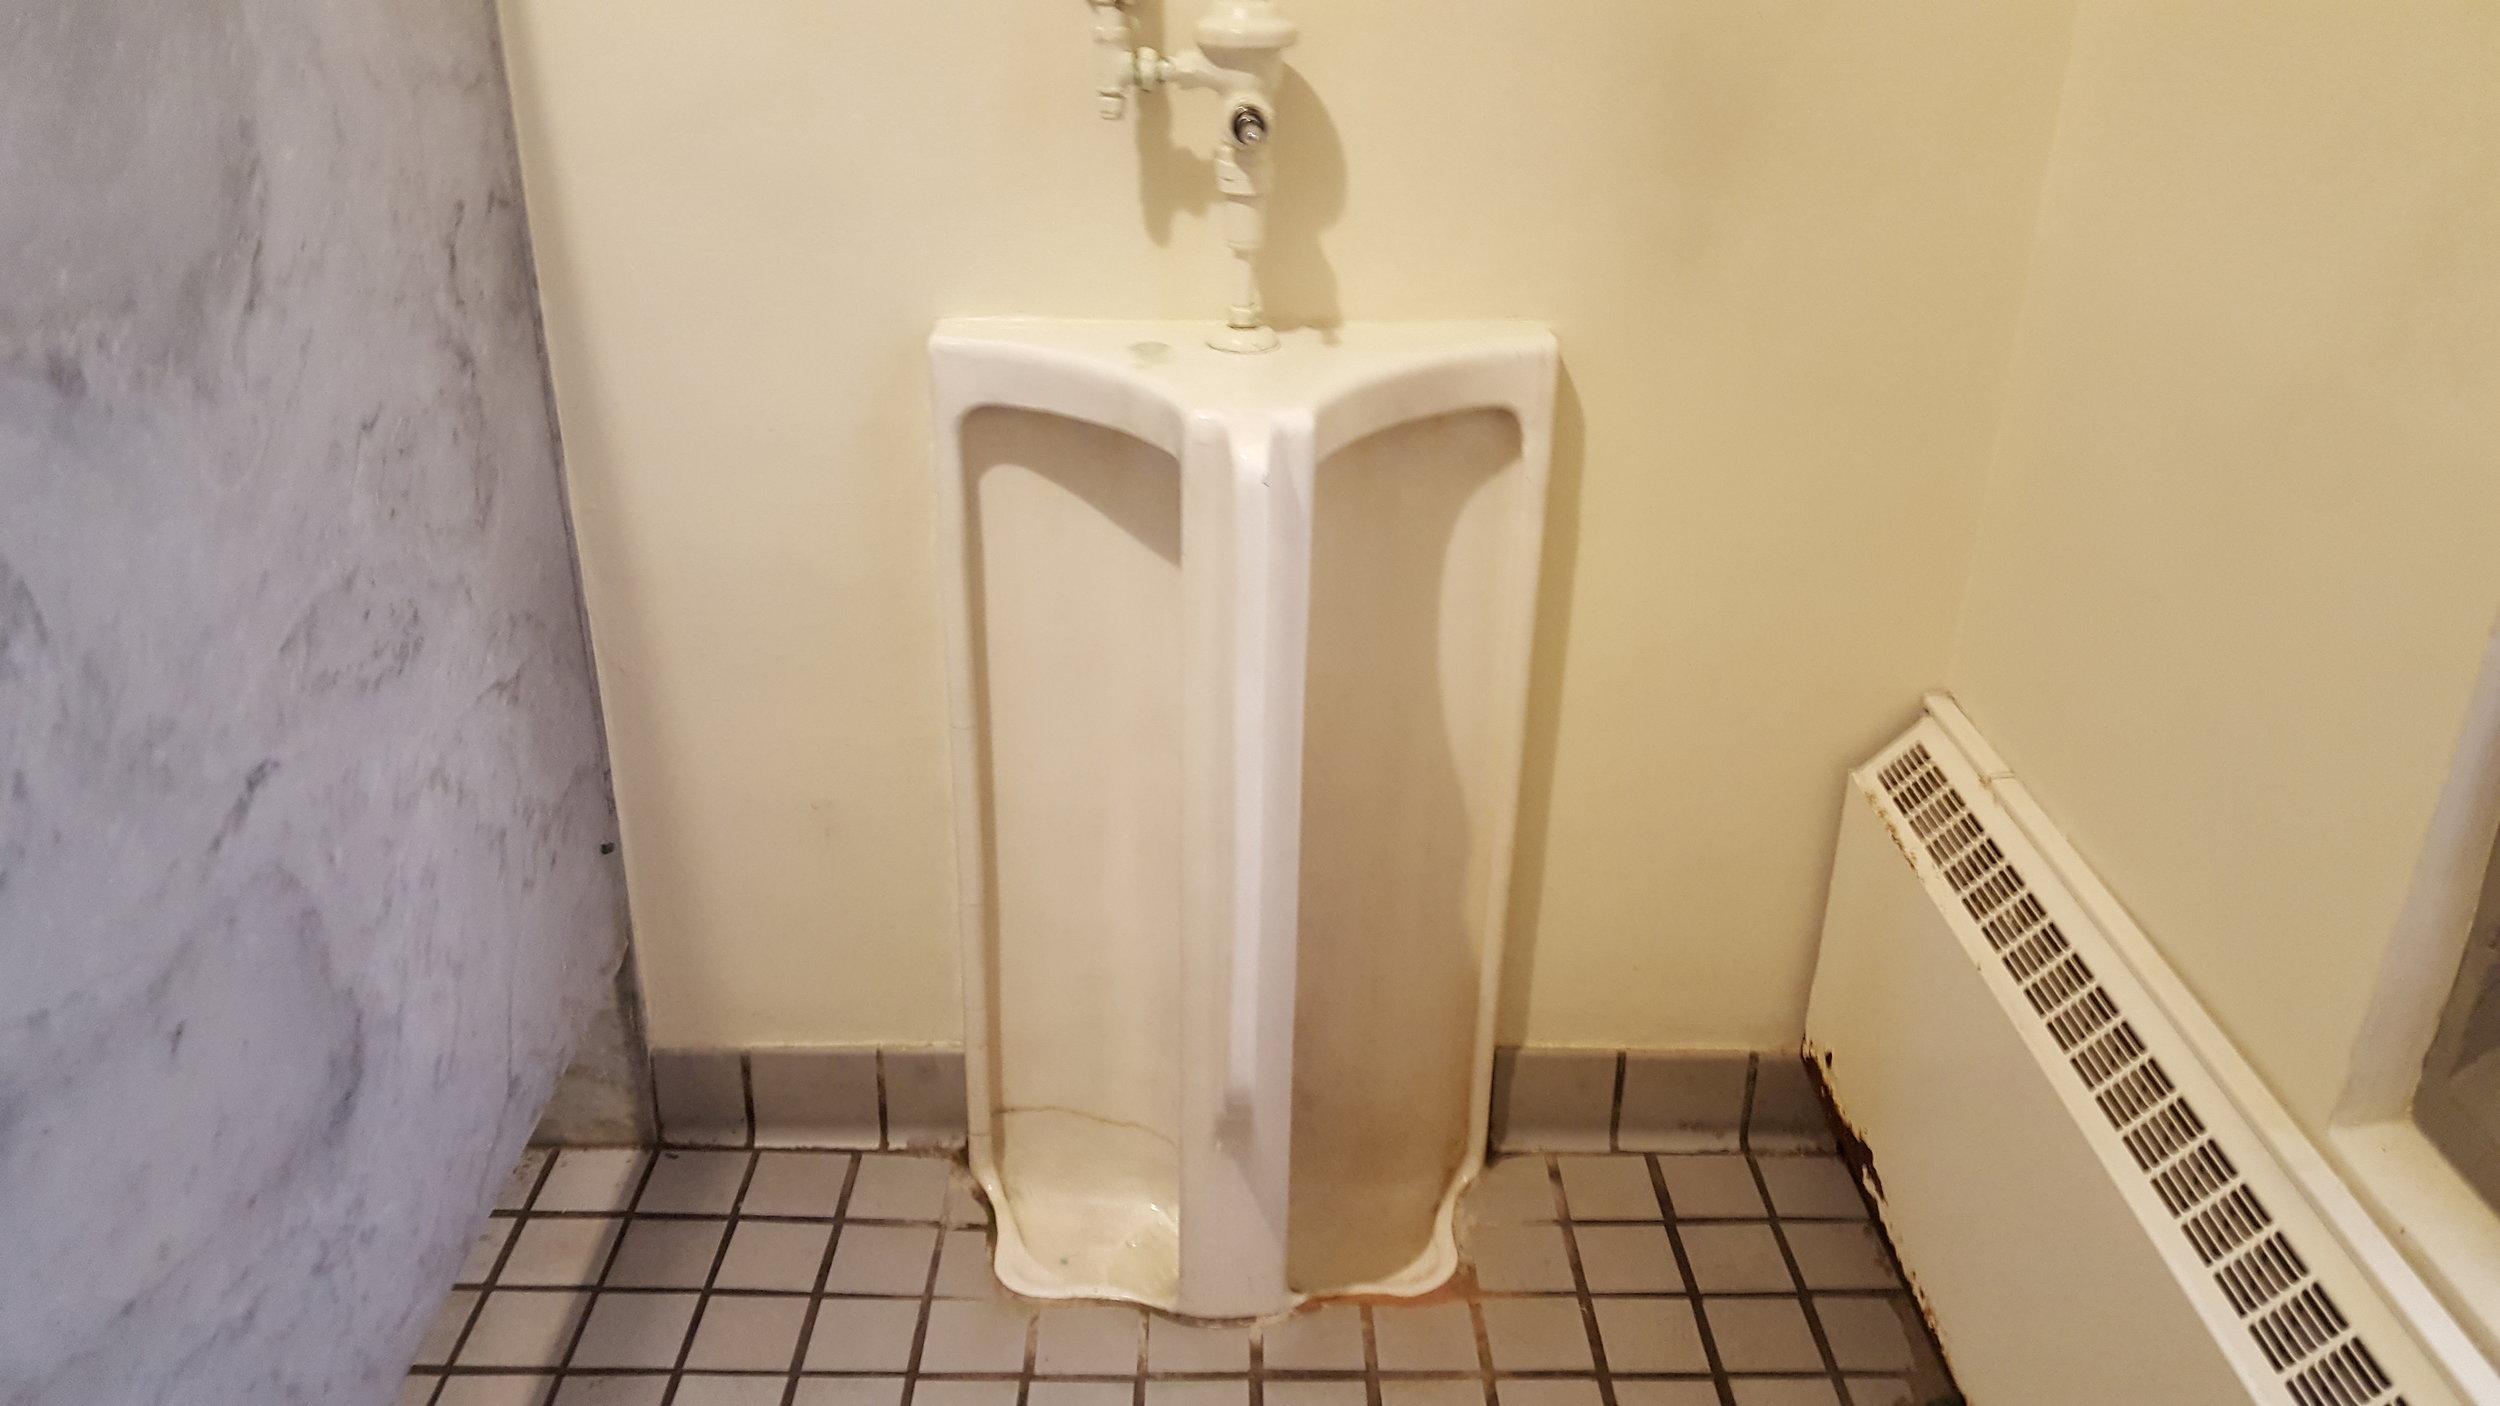 Methodist urinal chris congdon upstairs project